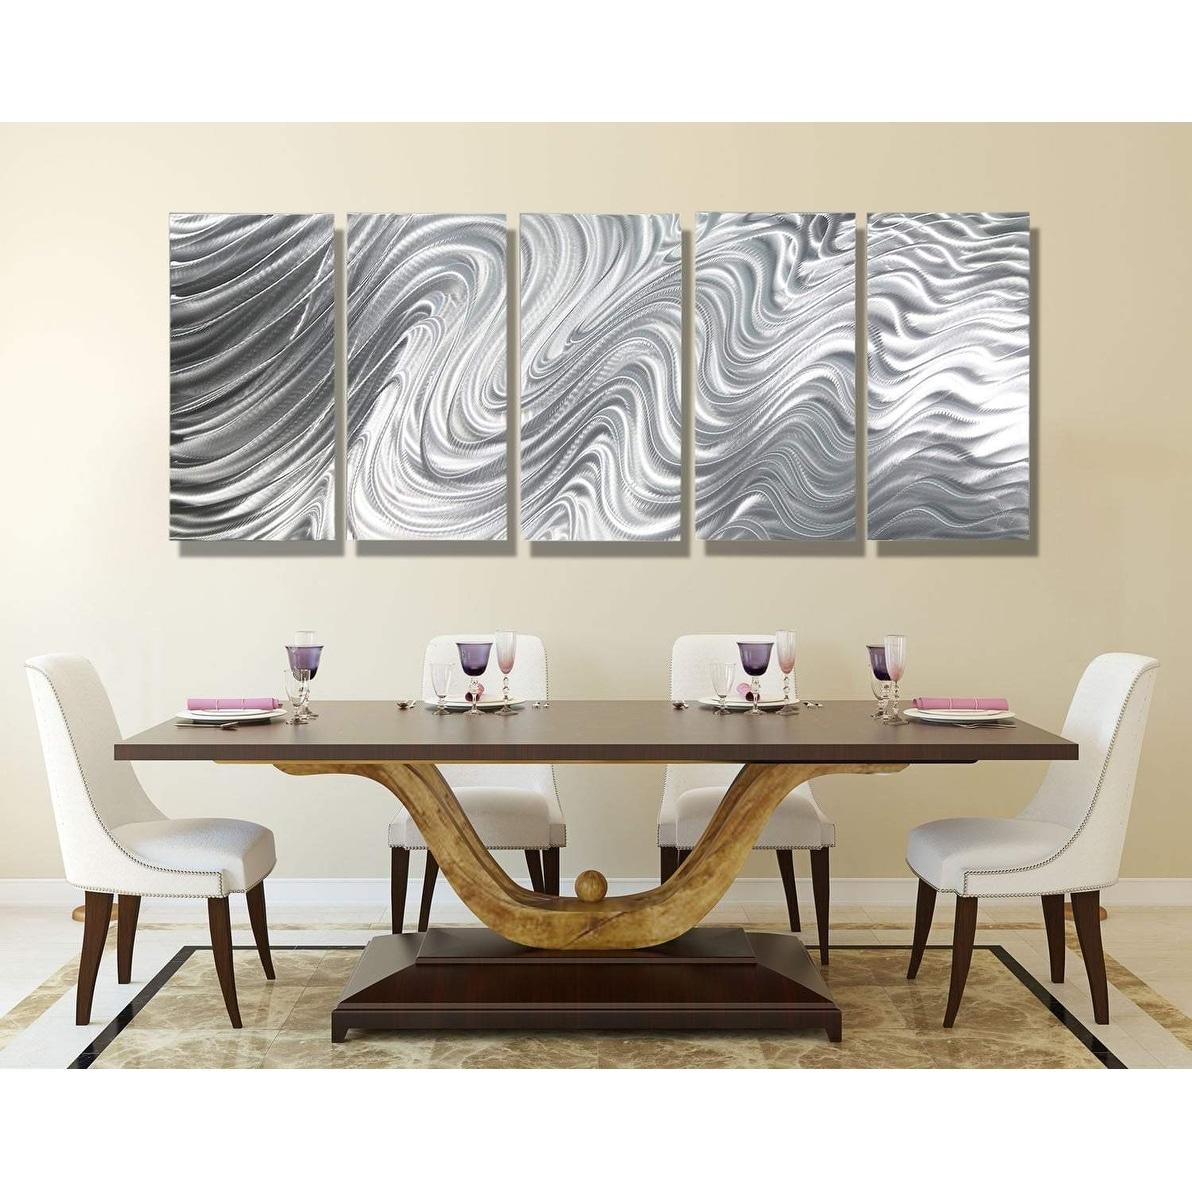 Statements2000 Large Silver Metal Wall Art Panels ...